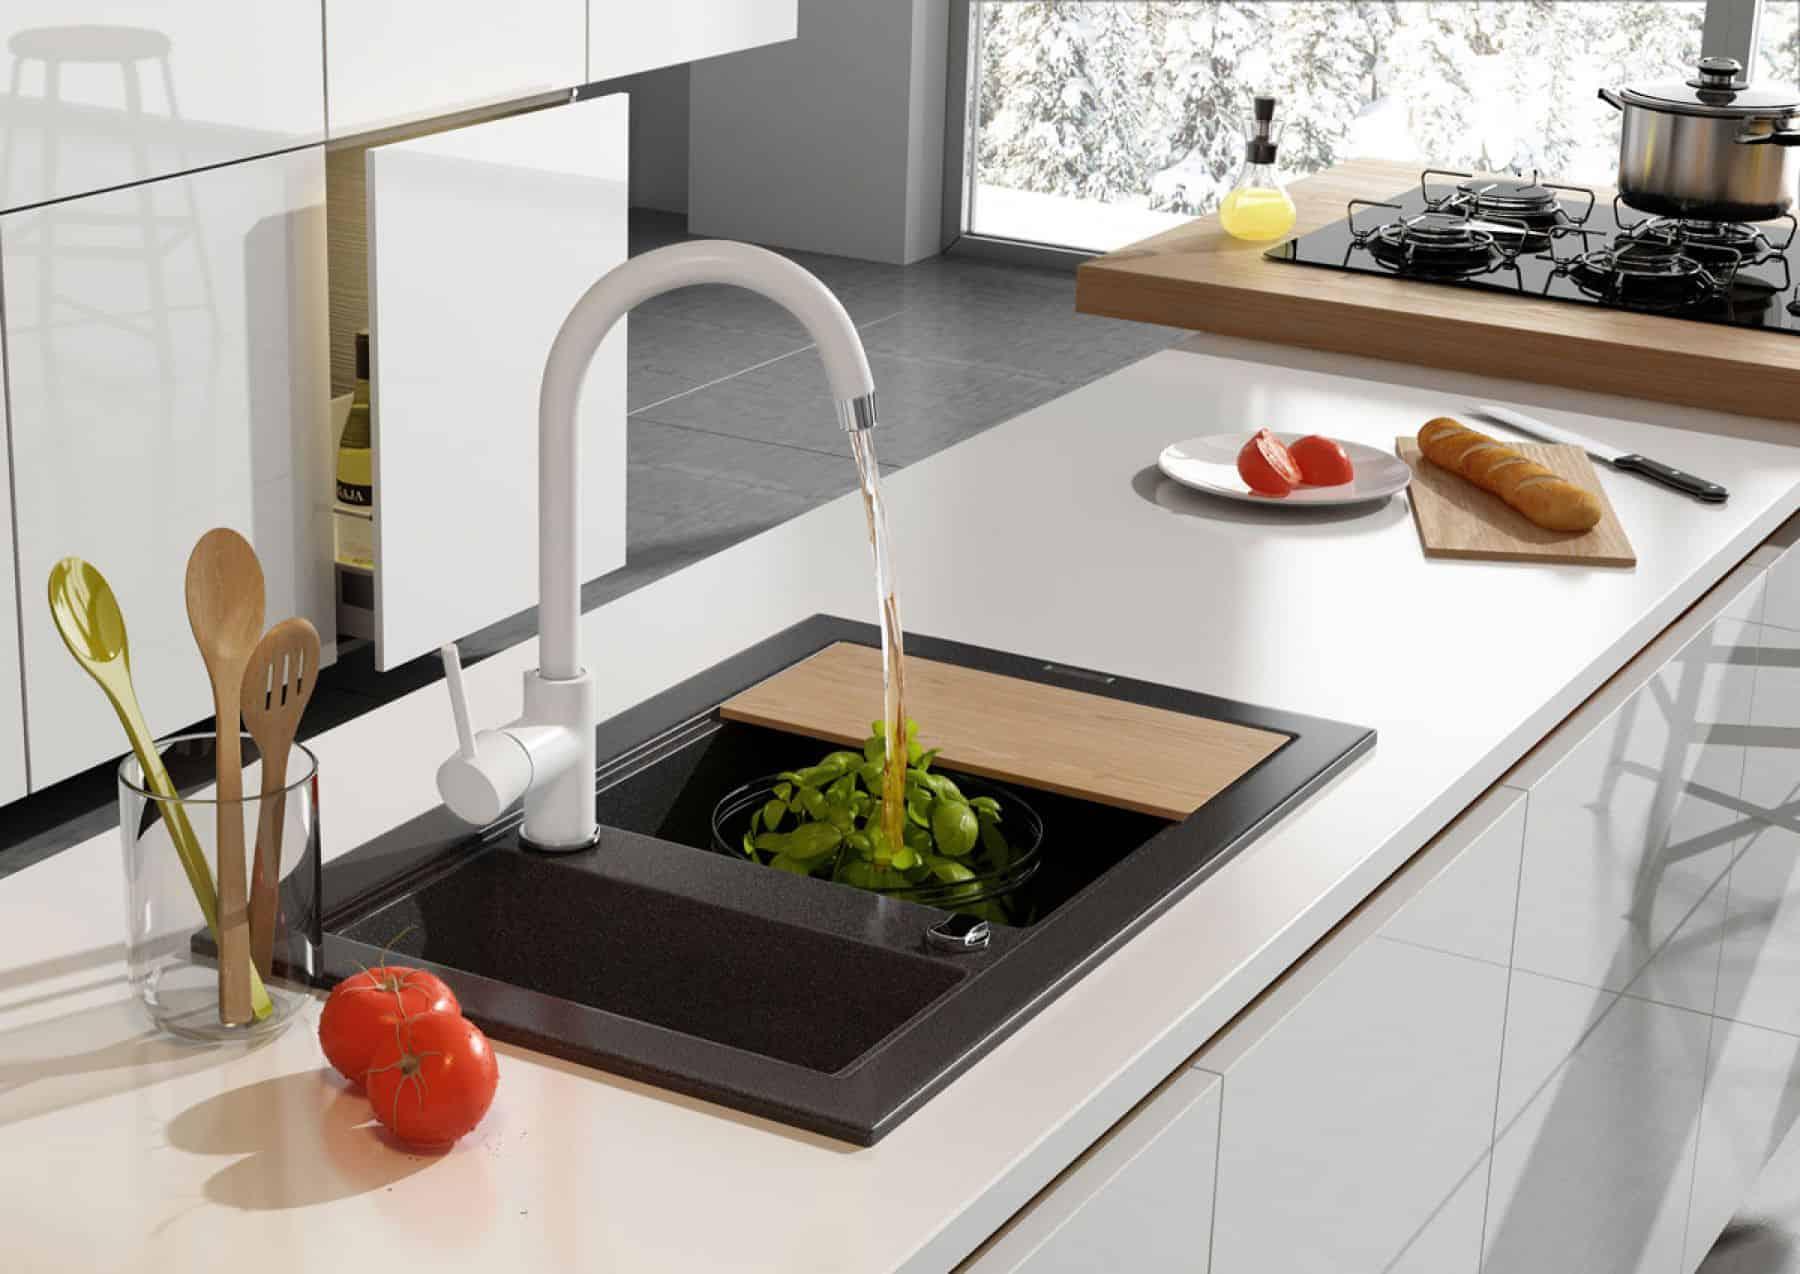 Design Keuken Kraan : Keukenkraan milin diverse kleuren sanitairkiezer